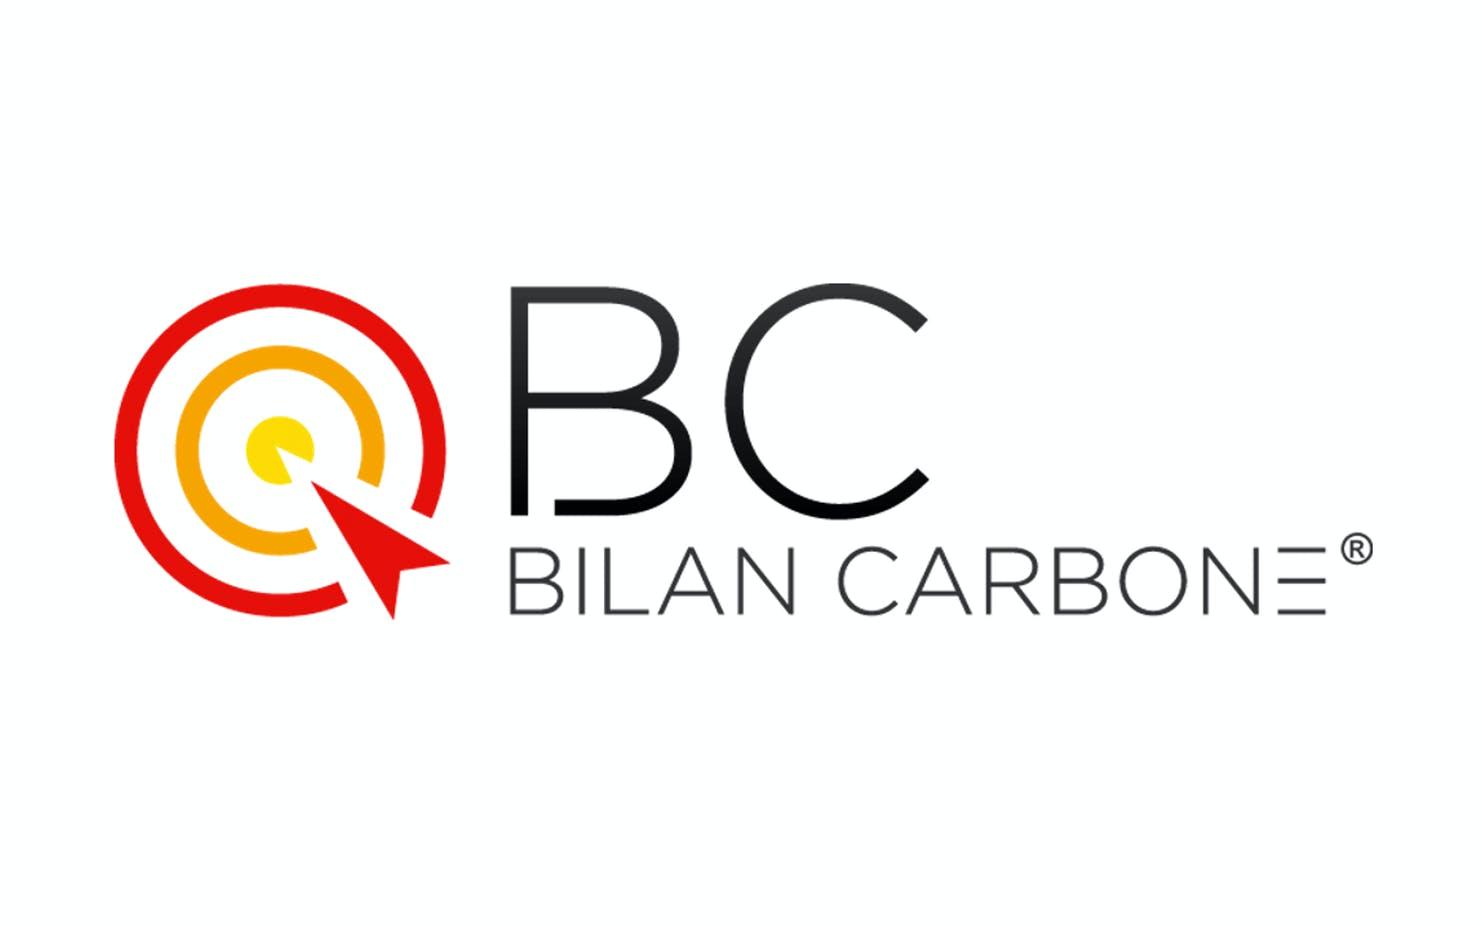 Qu'est-ce qu'un vrai Bilan Carbone ?